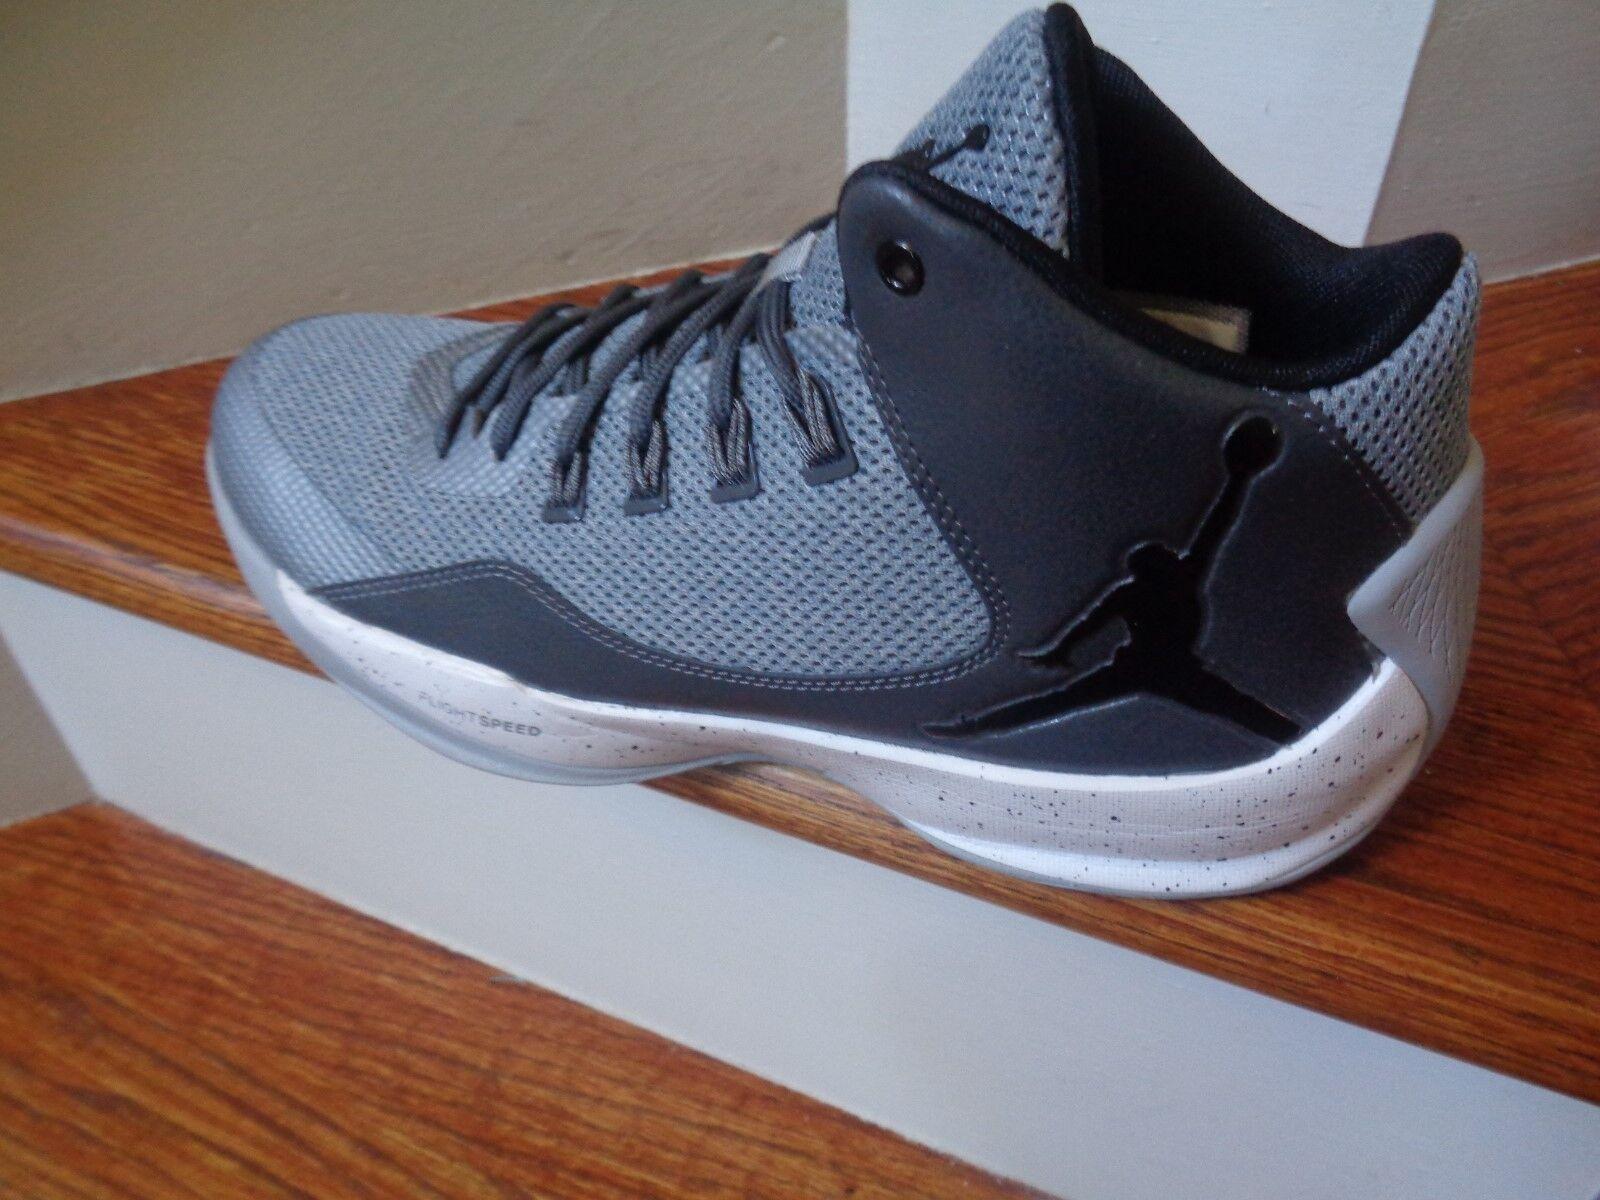 Nike Air Jordan 1 Rising High 2 Men's Basketball Shoes, 844065 007 Comfortable Seasonal clearance sale